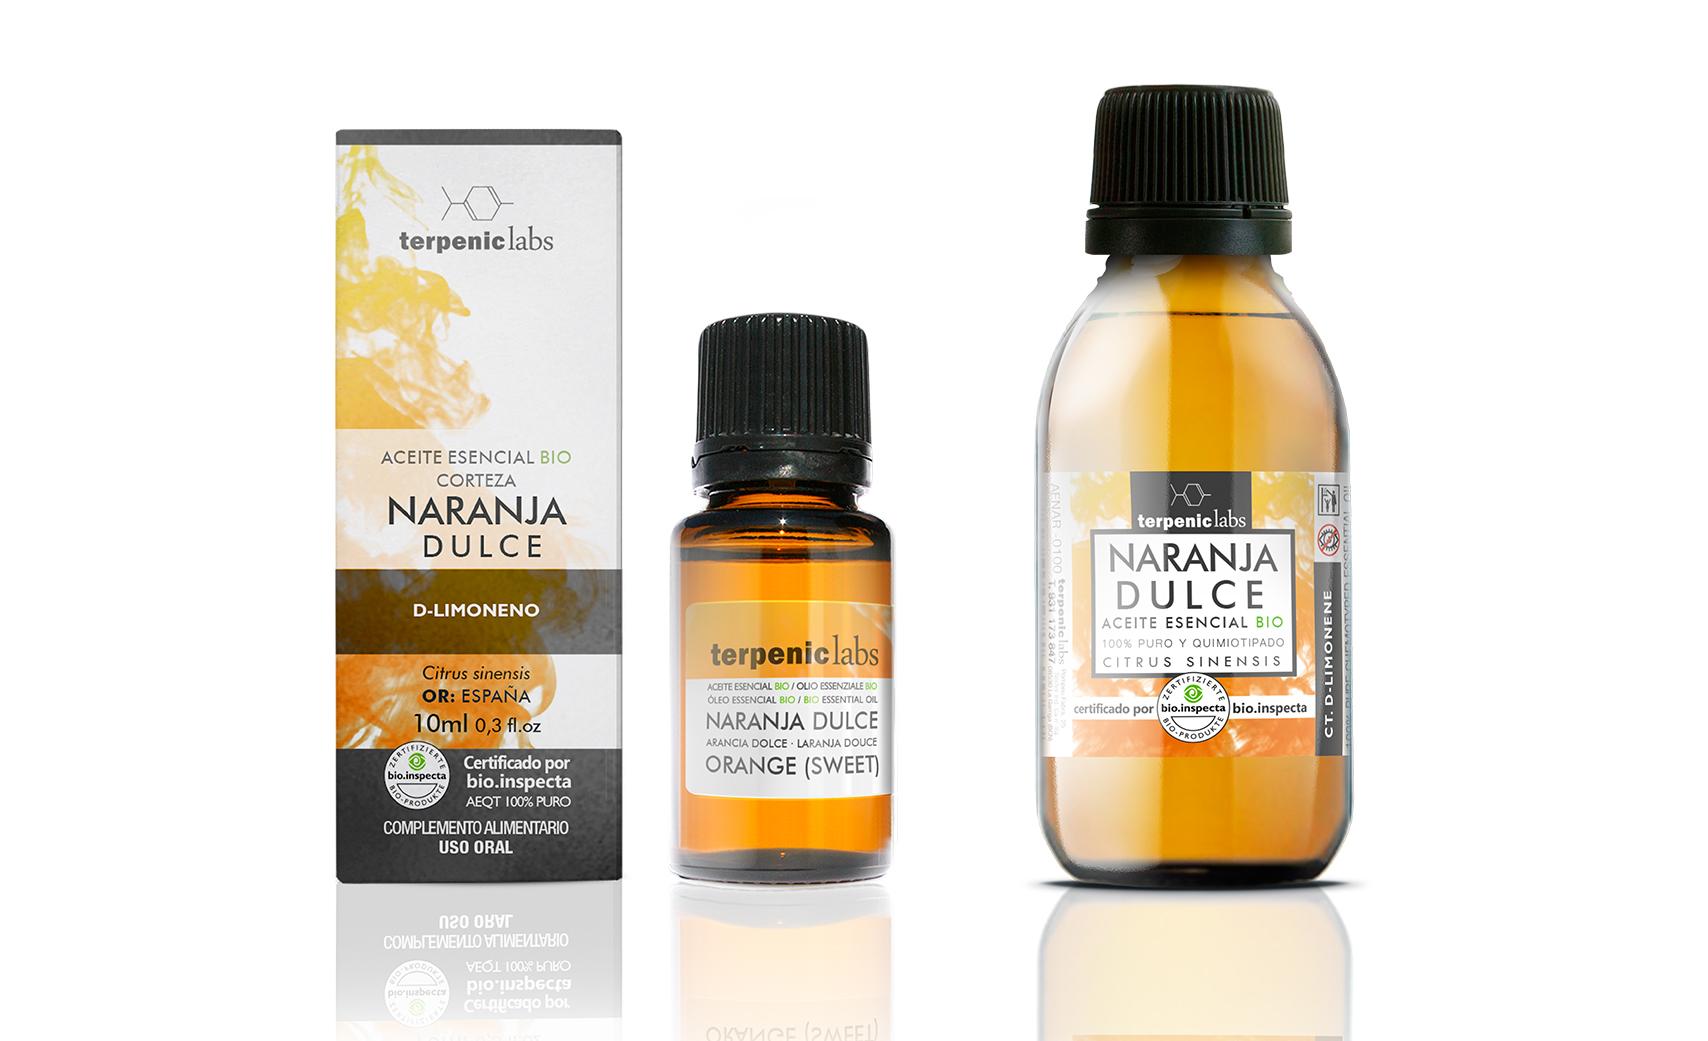 Naranja Dulce - Terpenic Labs